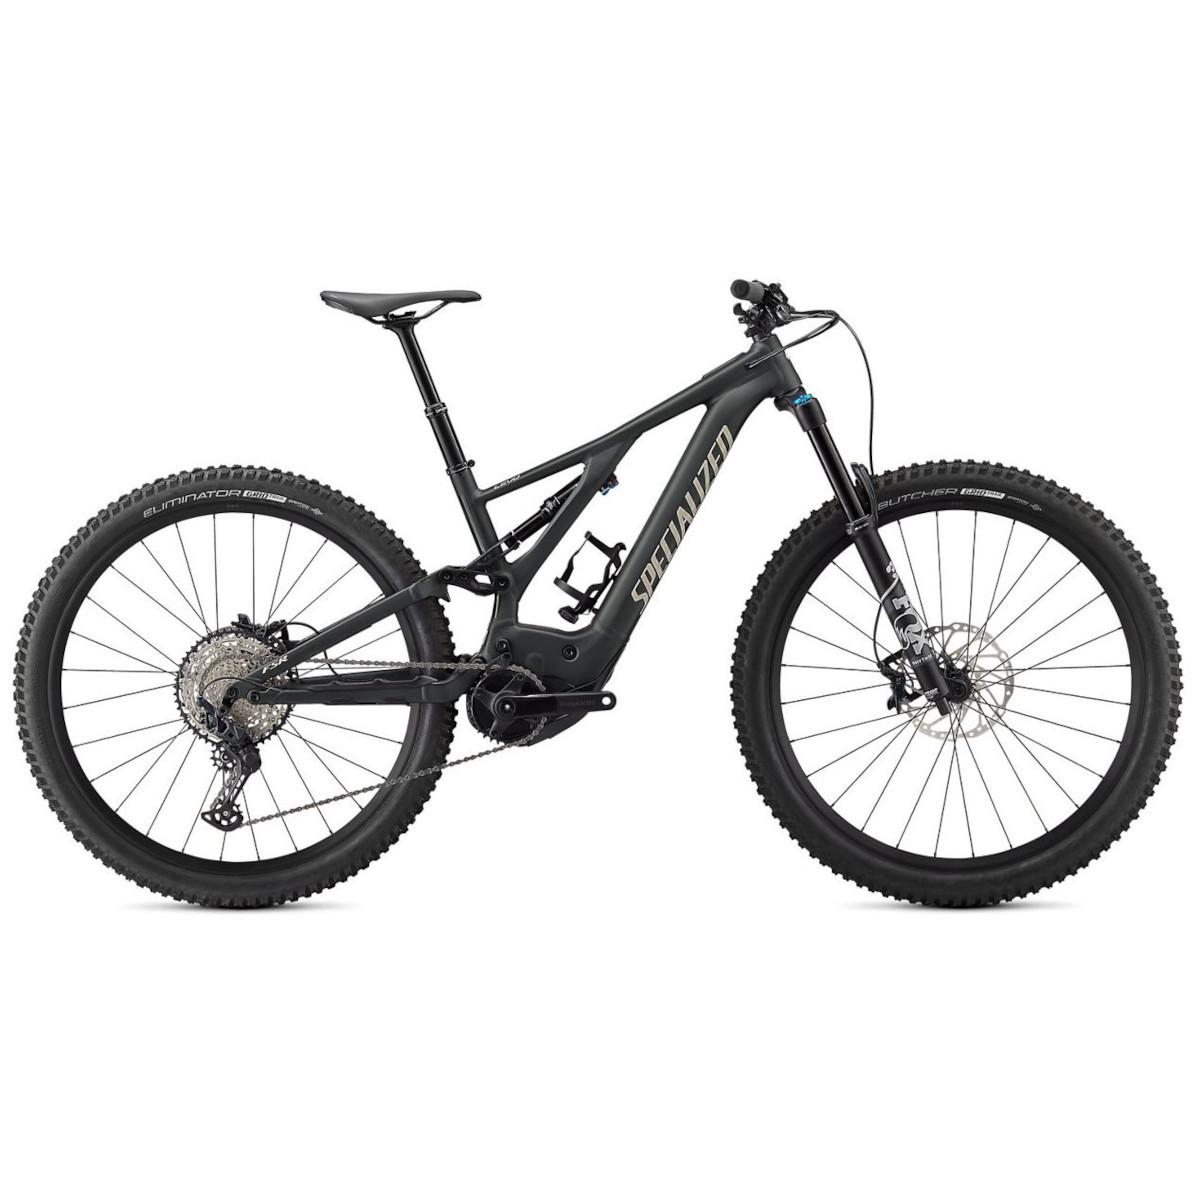 Foto de Specialized TURBO LEVO COMP 29 Bicicleta eléctrica de montaña - 2021 - oak green metallic / black / gloss white